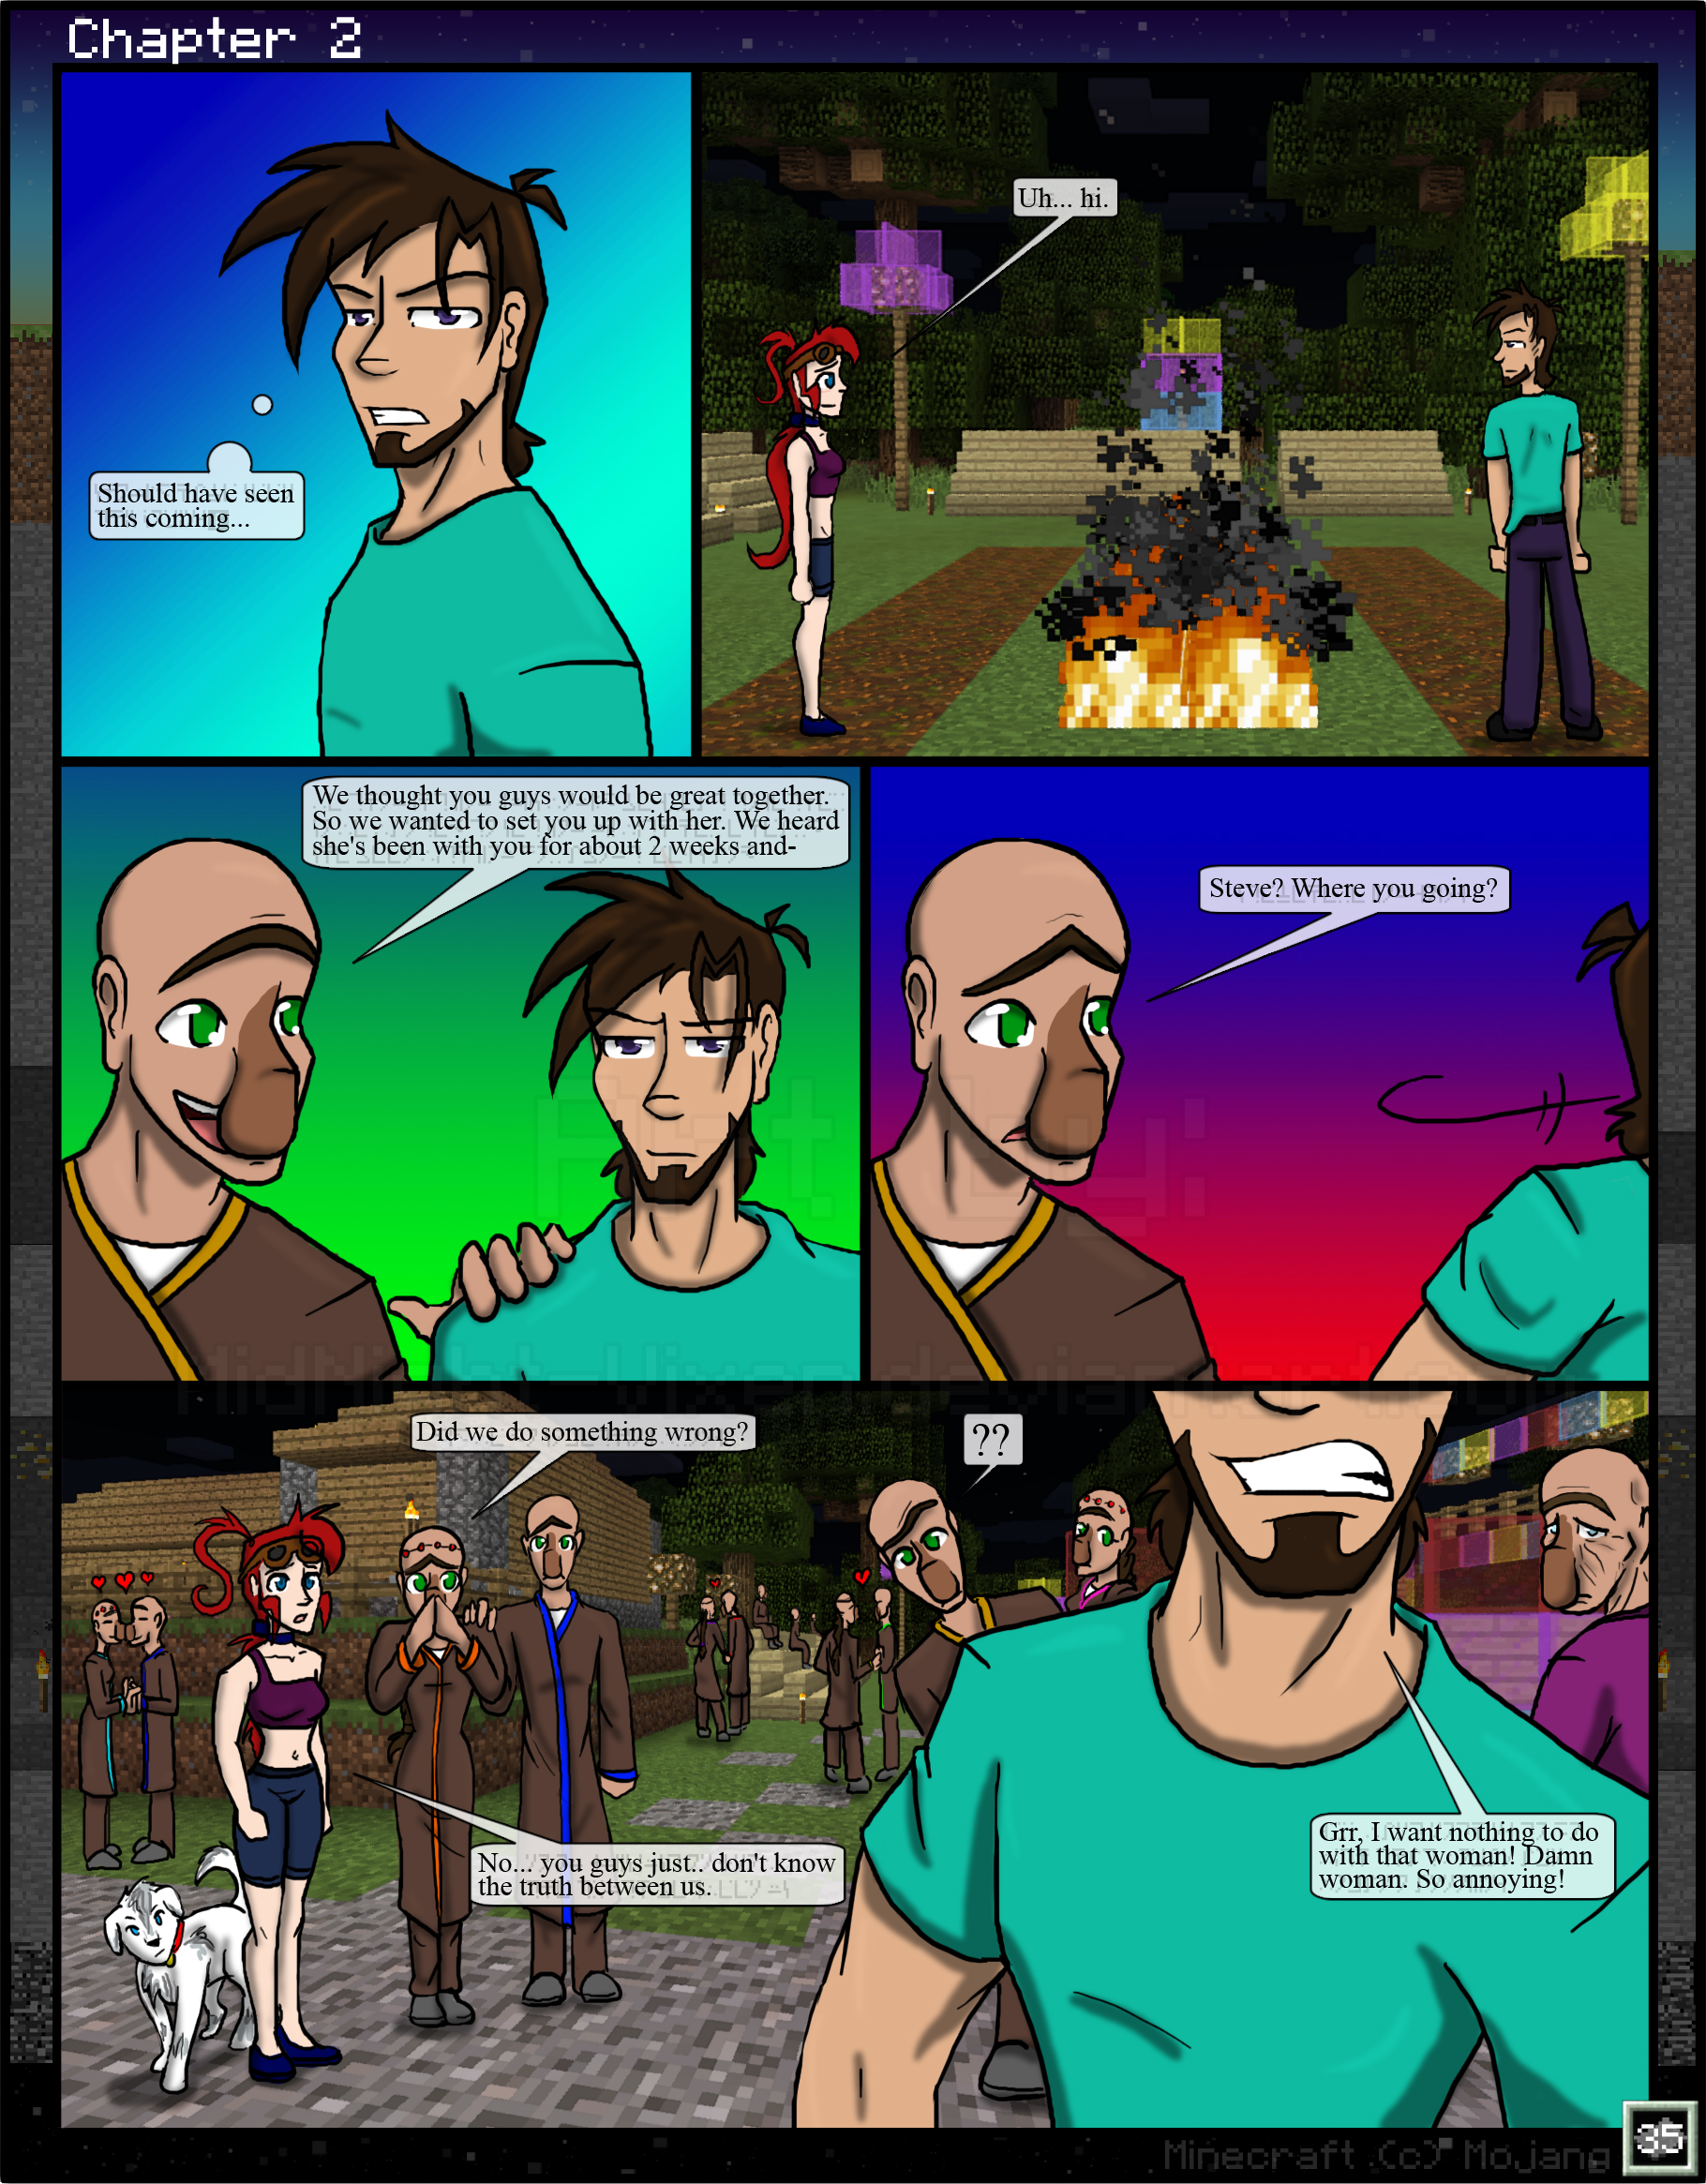 Minecraft: The Awakening Ch2. 35 by TomBoy-Comics on